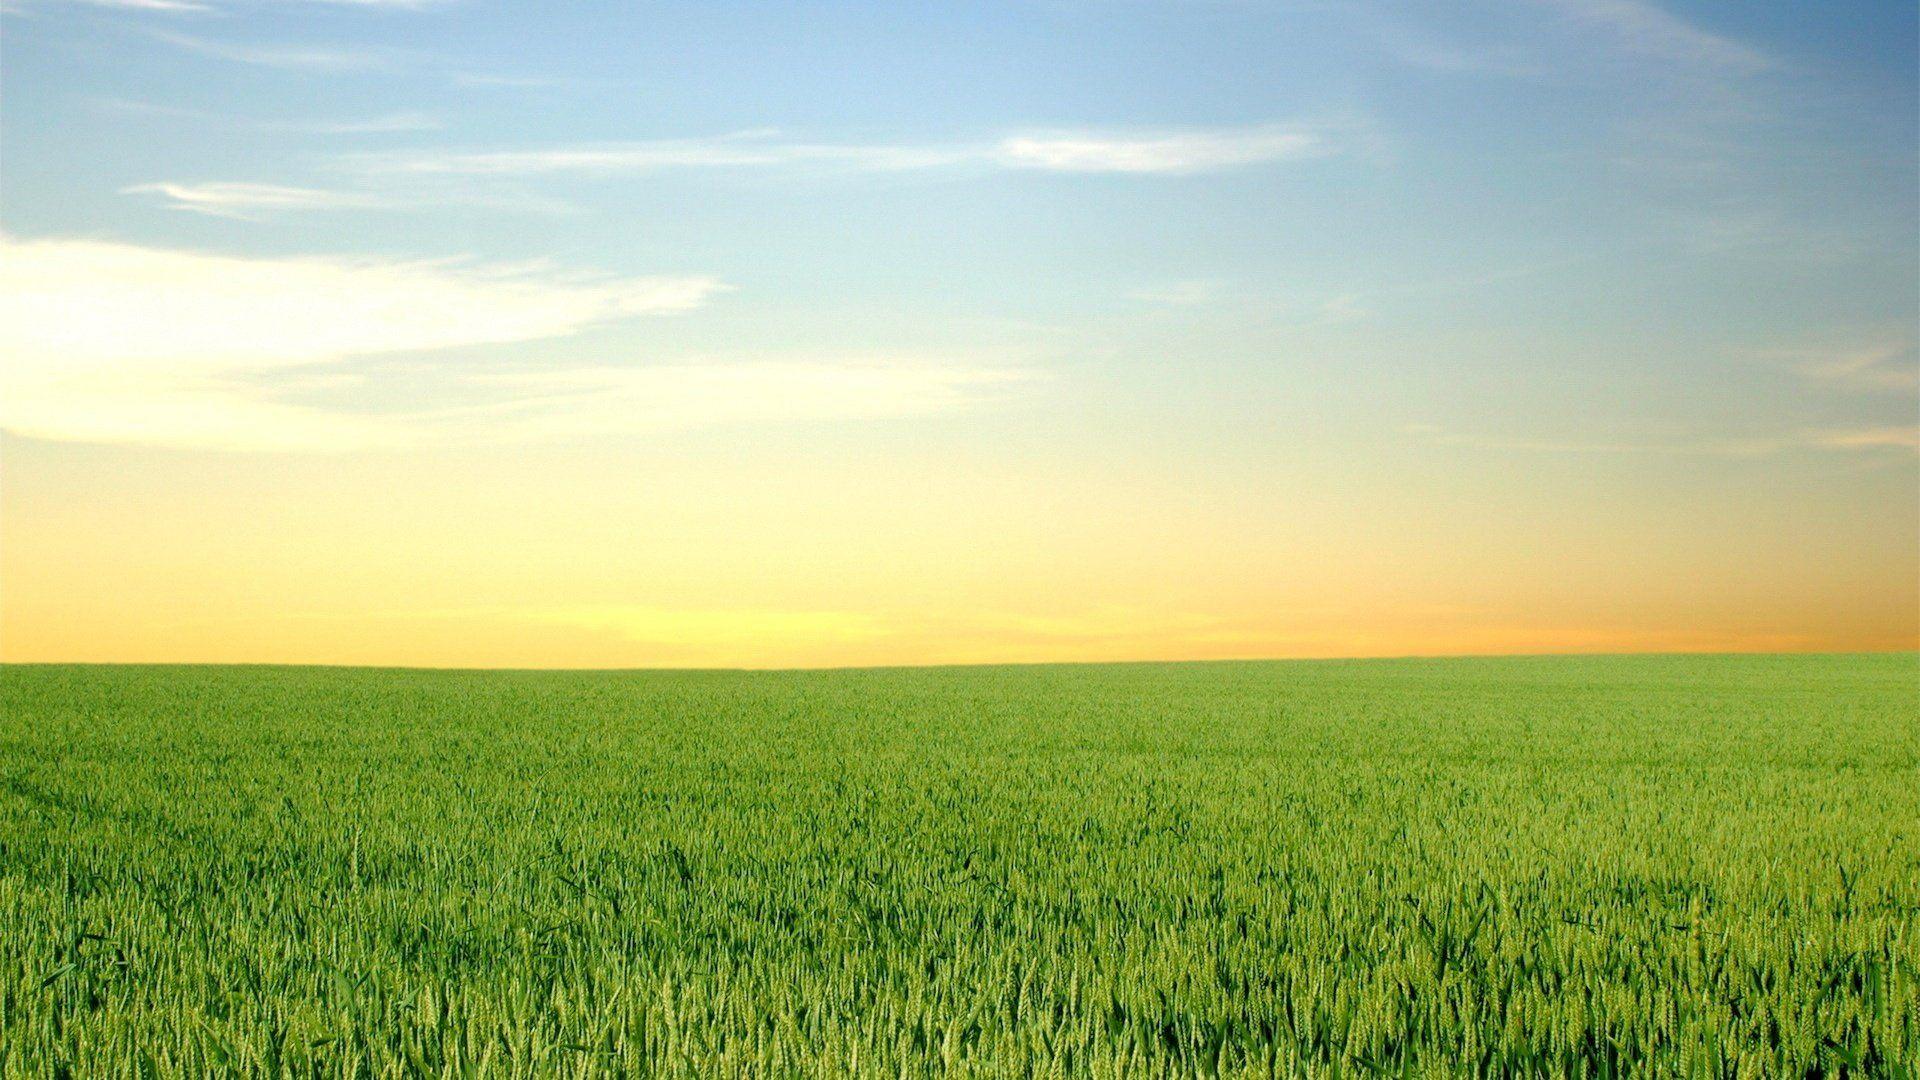 green grass and blus sky wallpaper